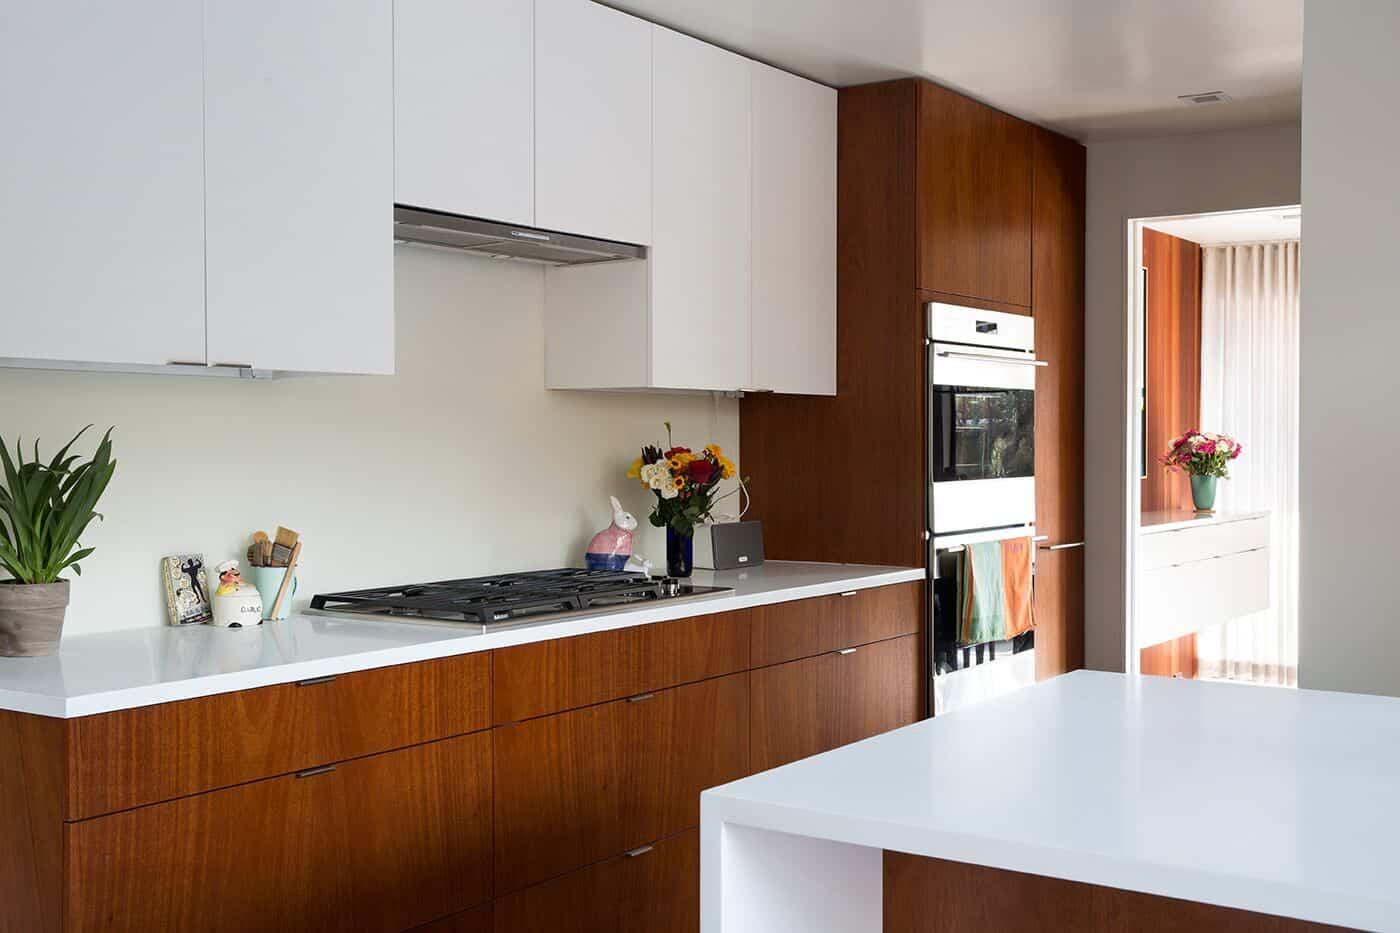 San Francisco Eichler Remodel-Klopf Architecture-10-1 Kindesign